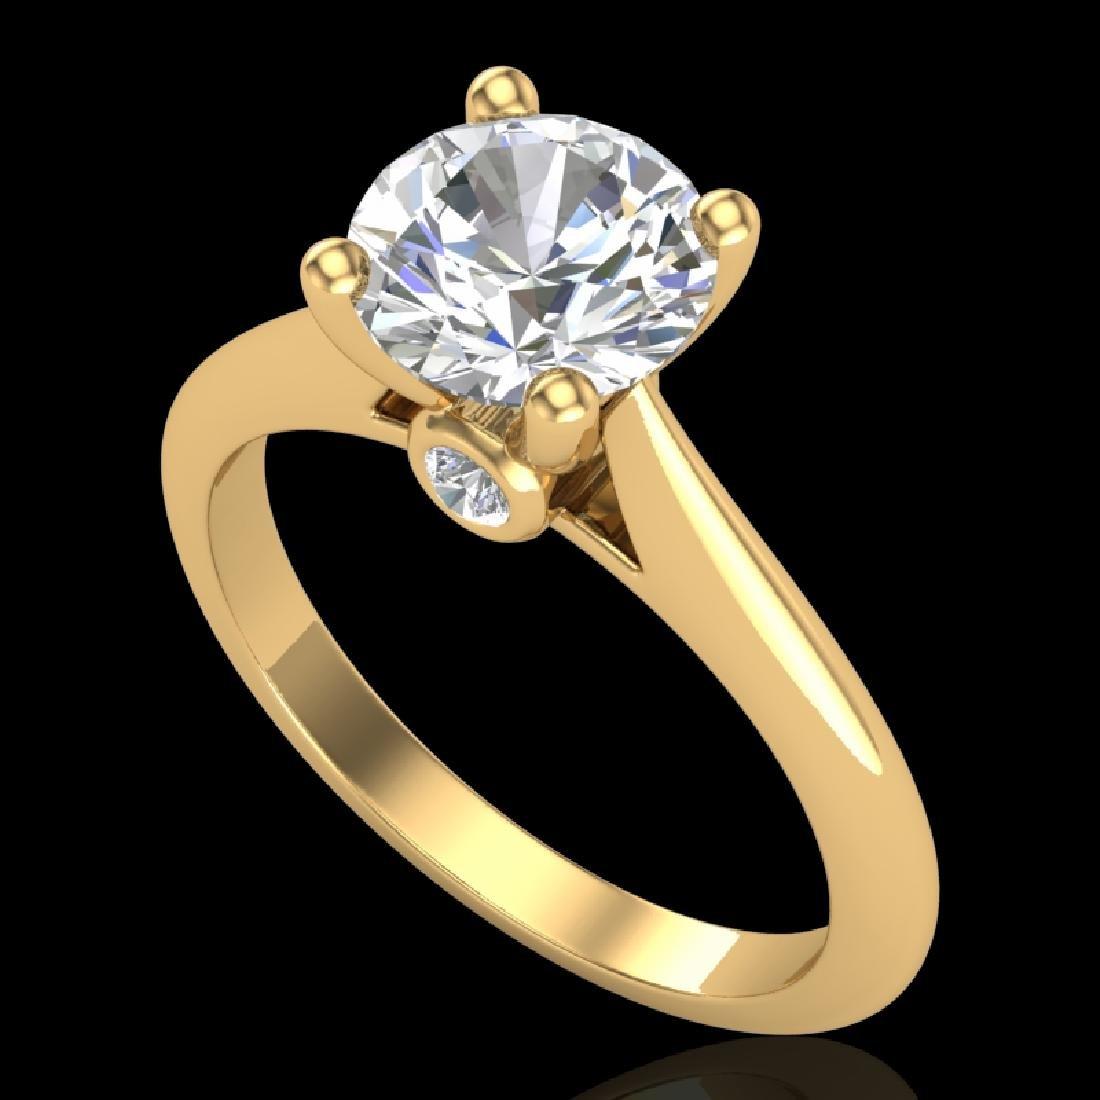 1.6 CTW VS/SI Diamond Art Deco Ring 18K Yellow Gold